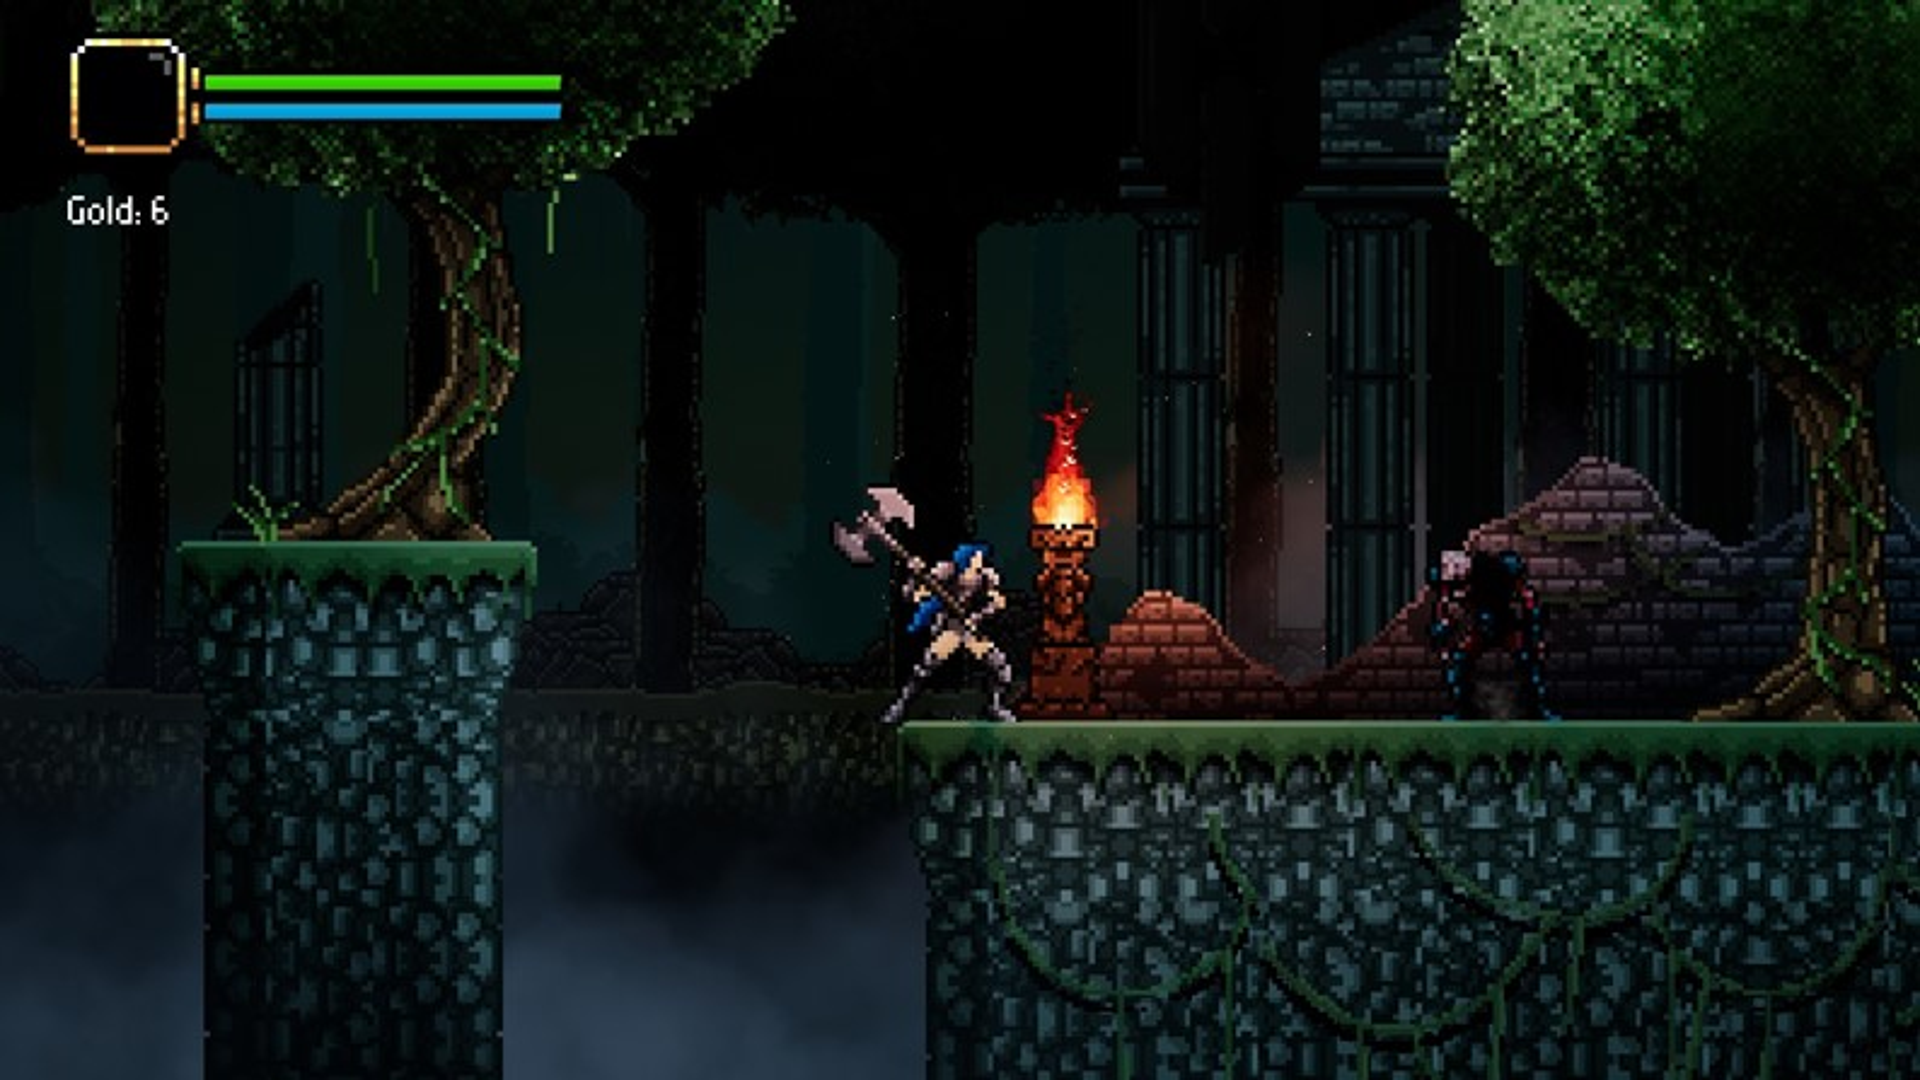 Na GGRJ 2018, os games indie ganharam destaque